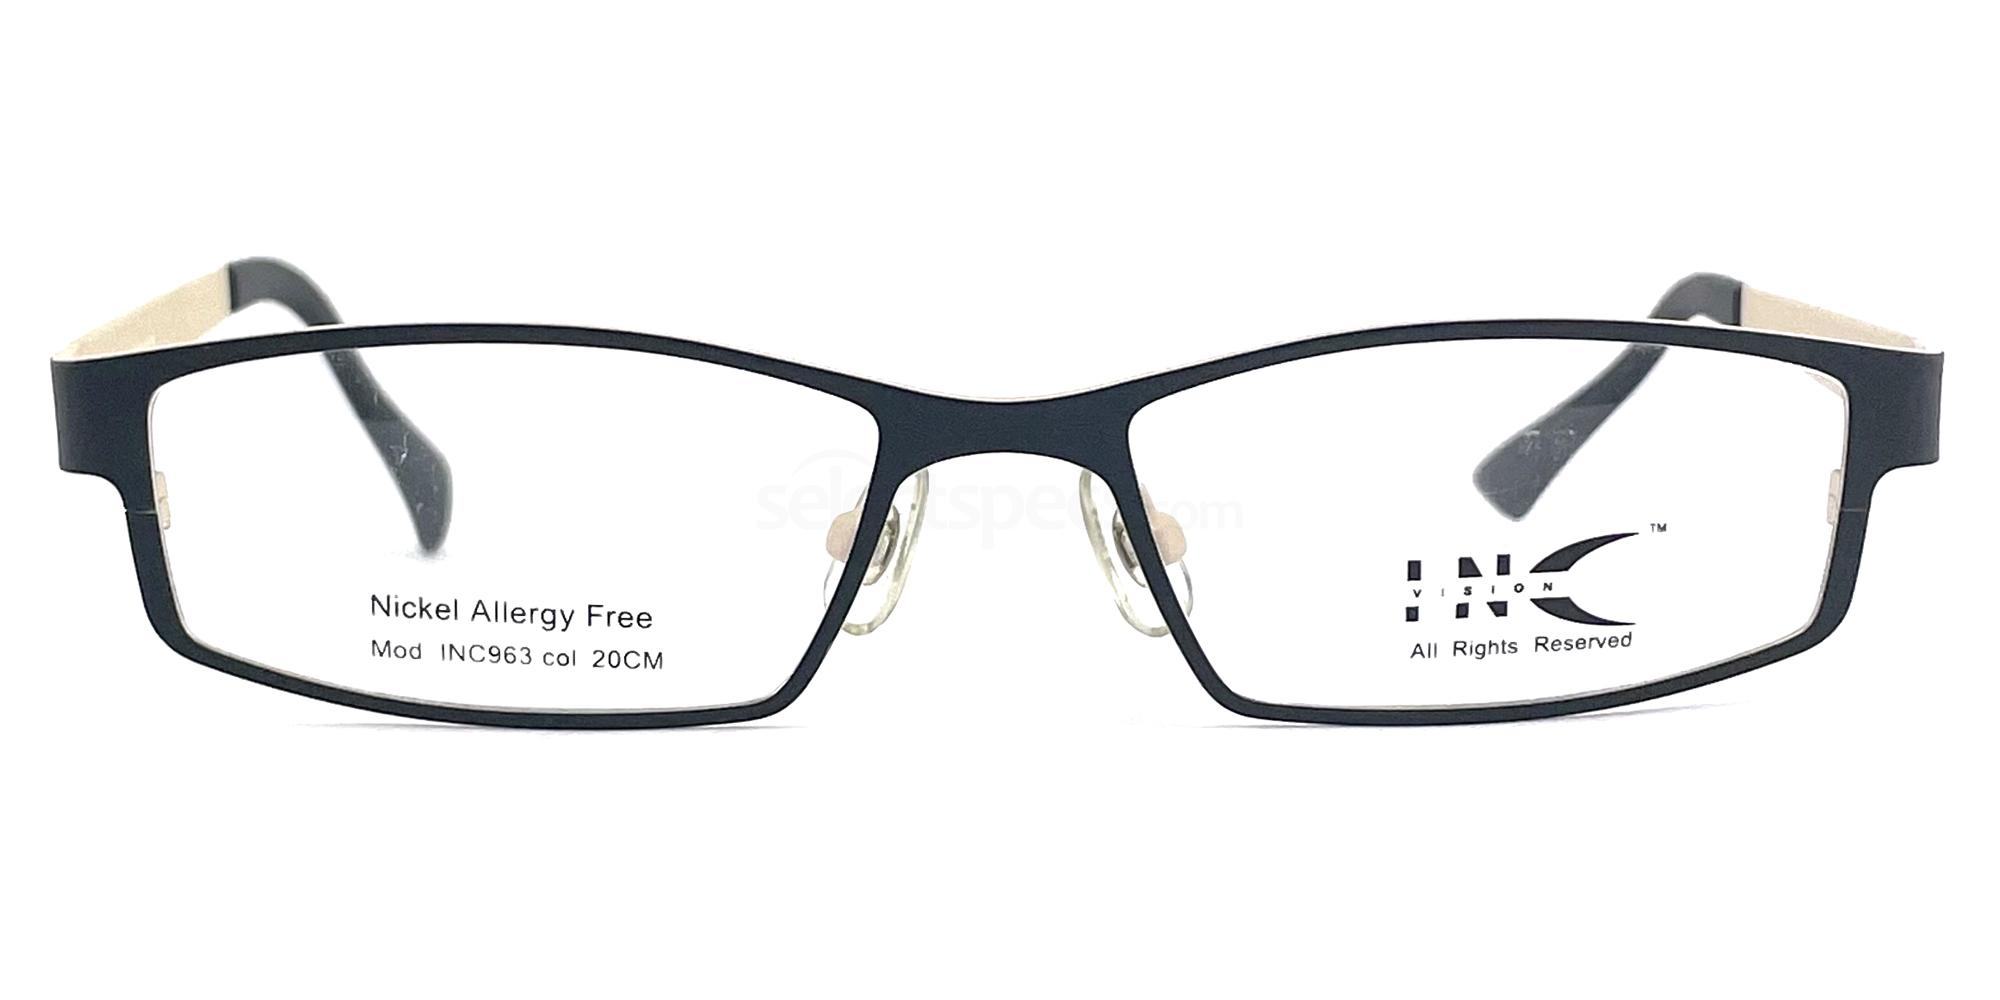 20CM INC 963 Glasses, INC Vision